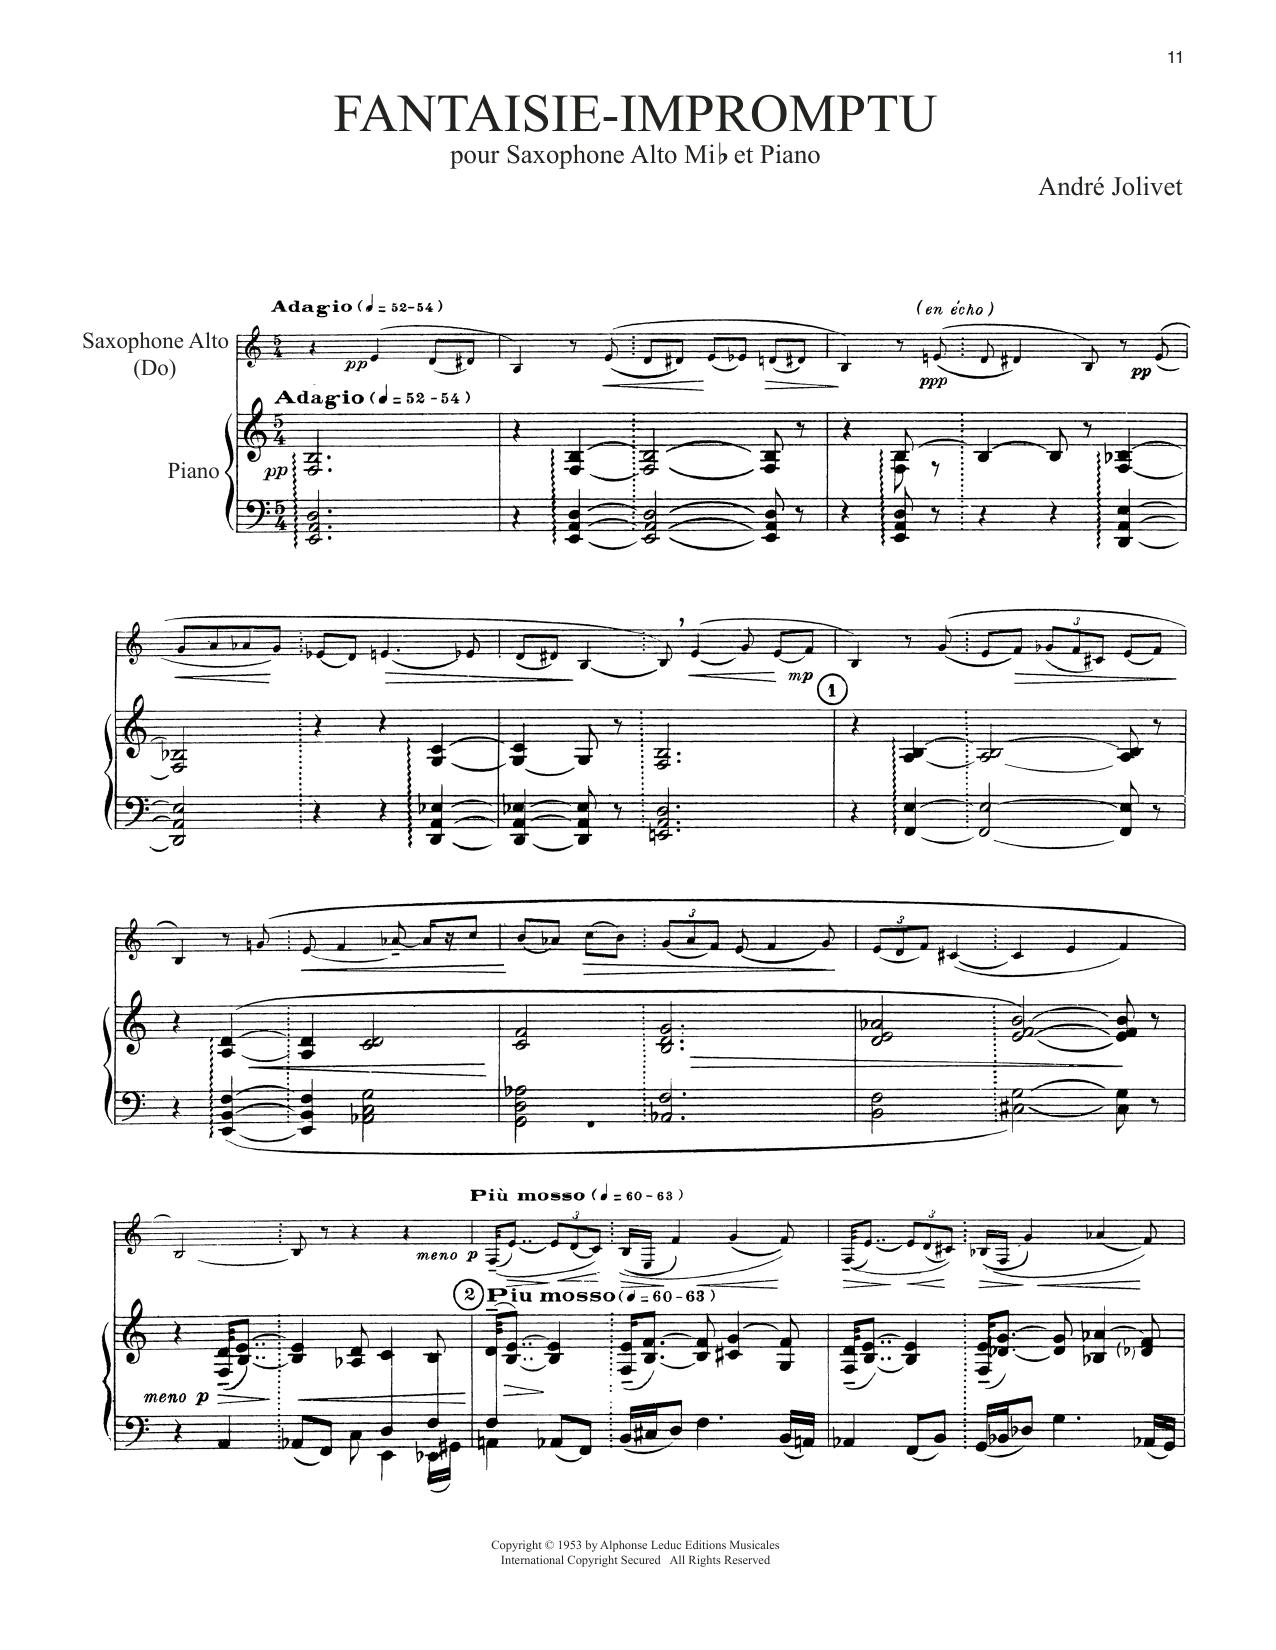 Fantaisie-Impromptu (Alto Sax and Piano)